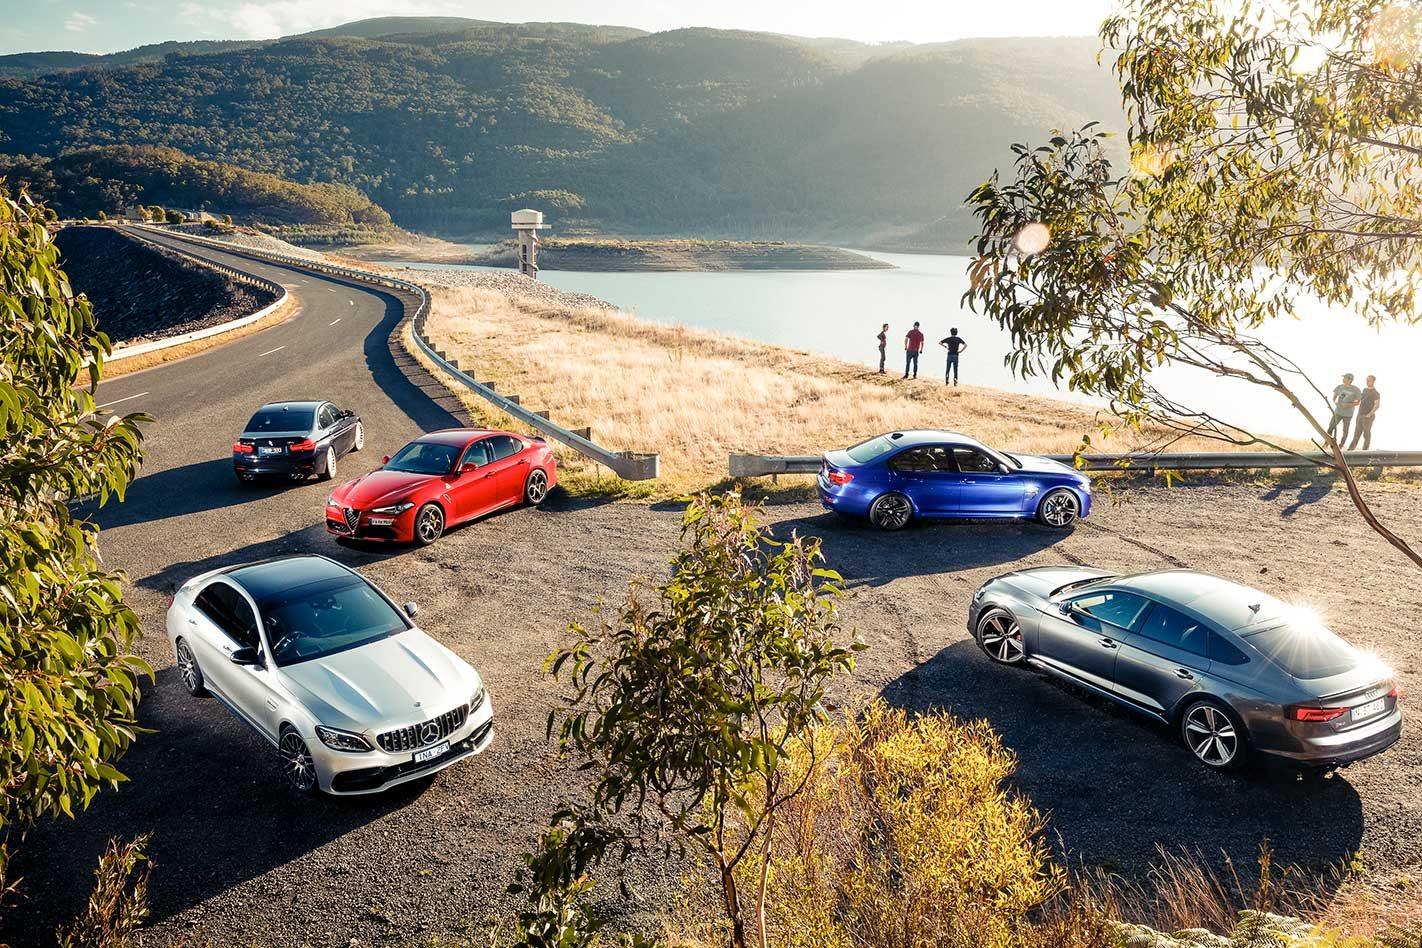 2019 Mercedes Amg C63 S Vs Audi Rs5 Sportback Vs Bmw M3 Pure Vs Alfa